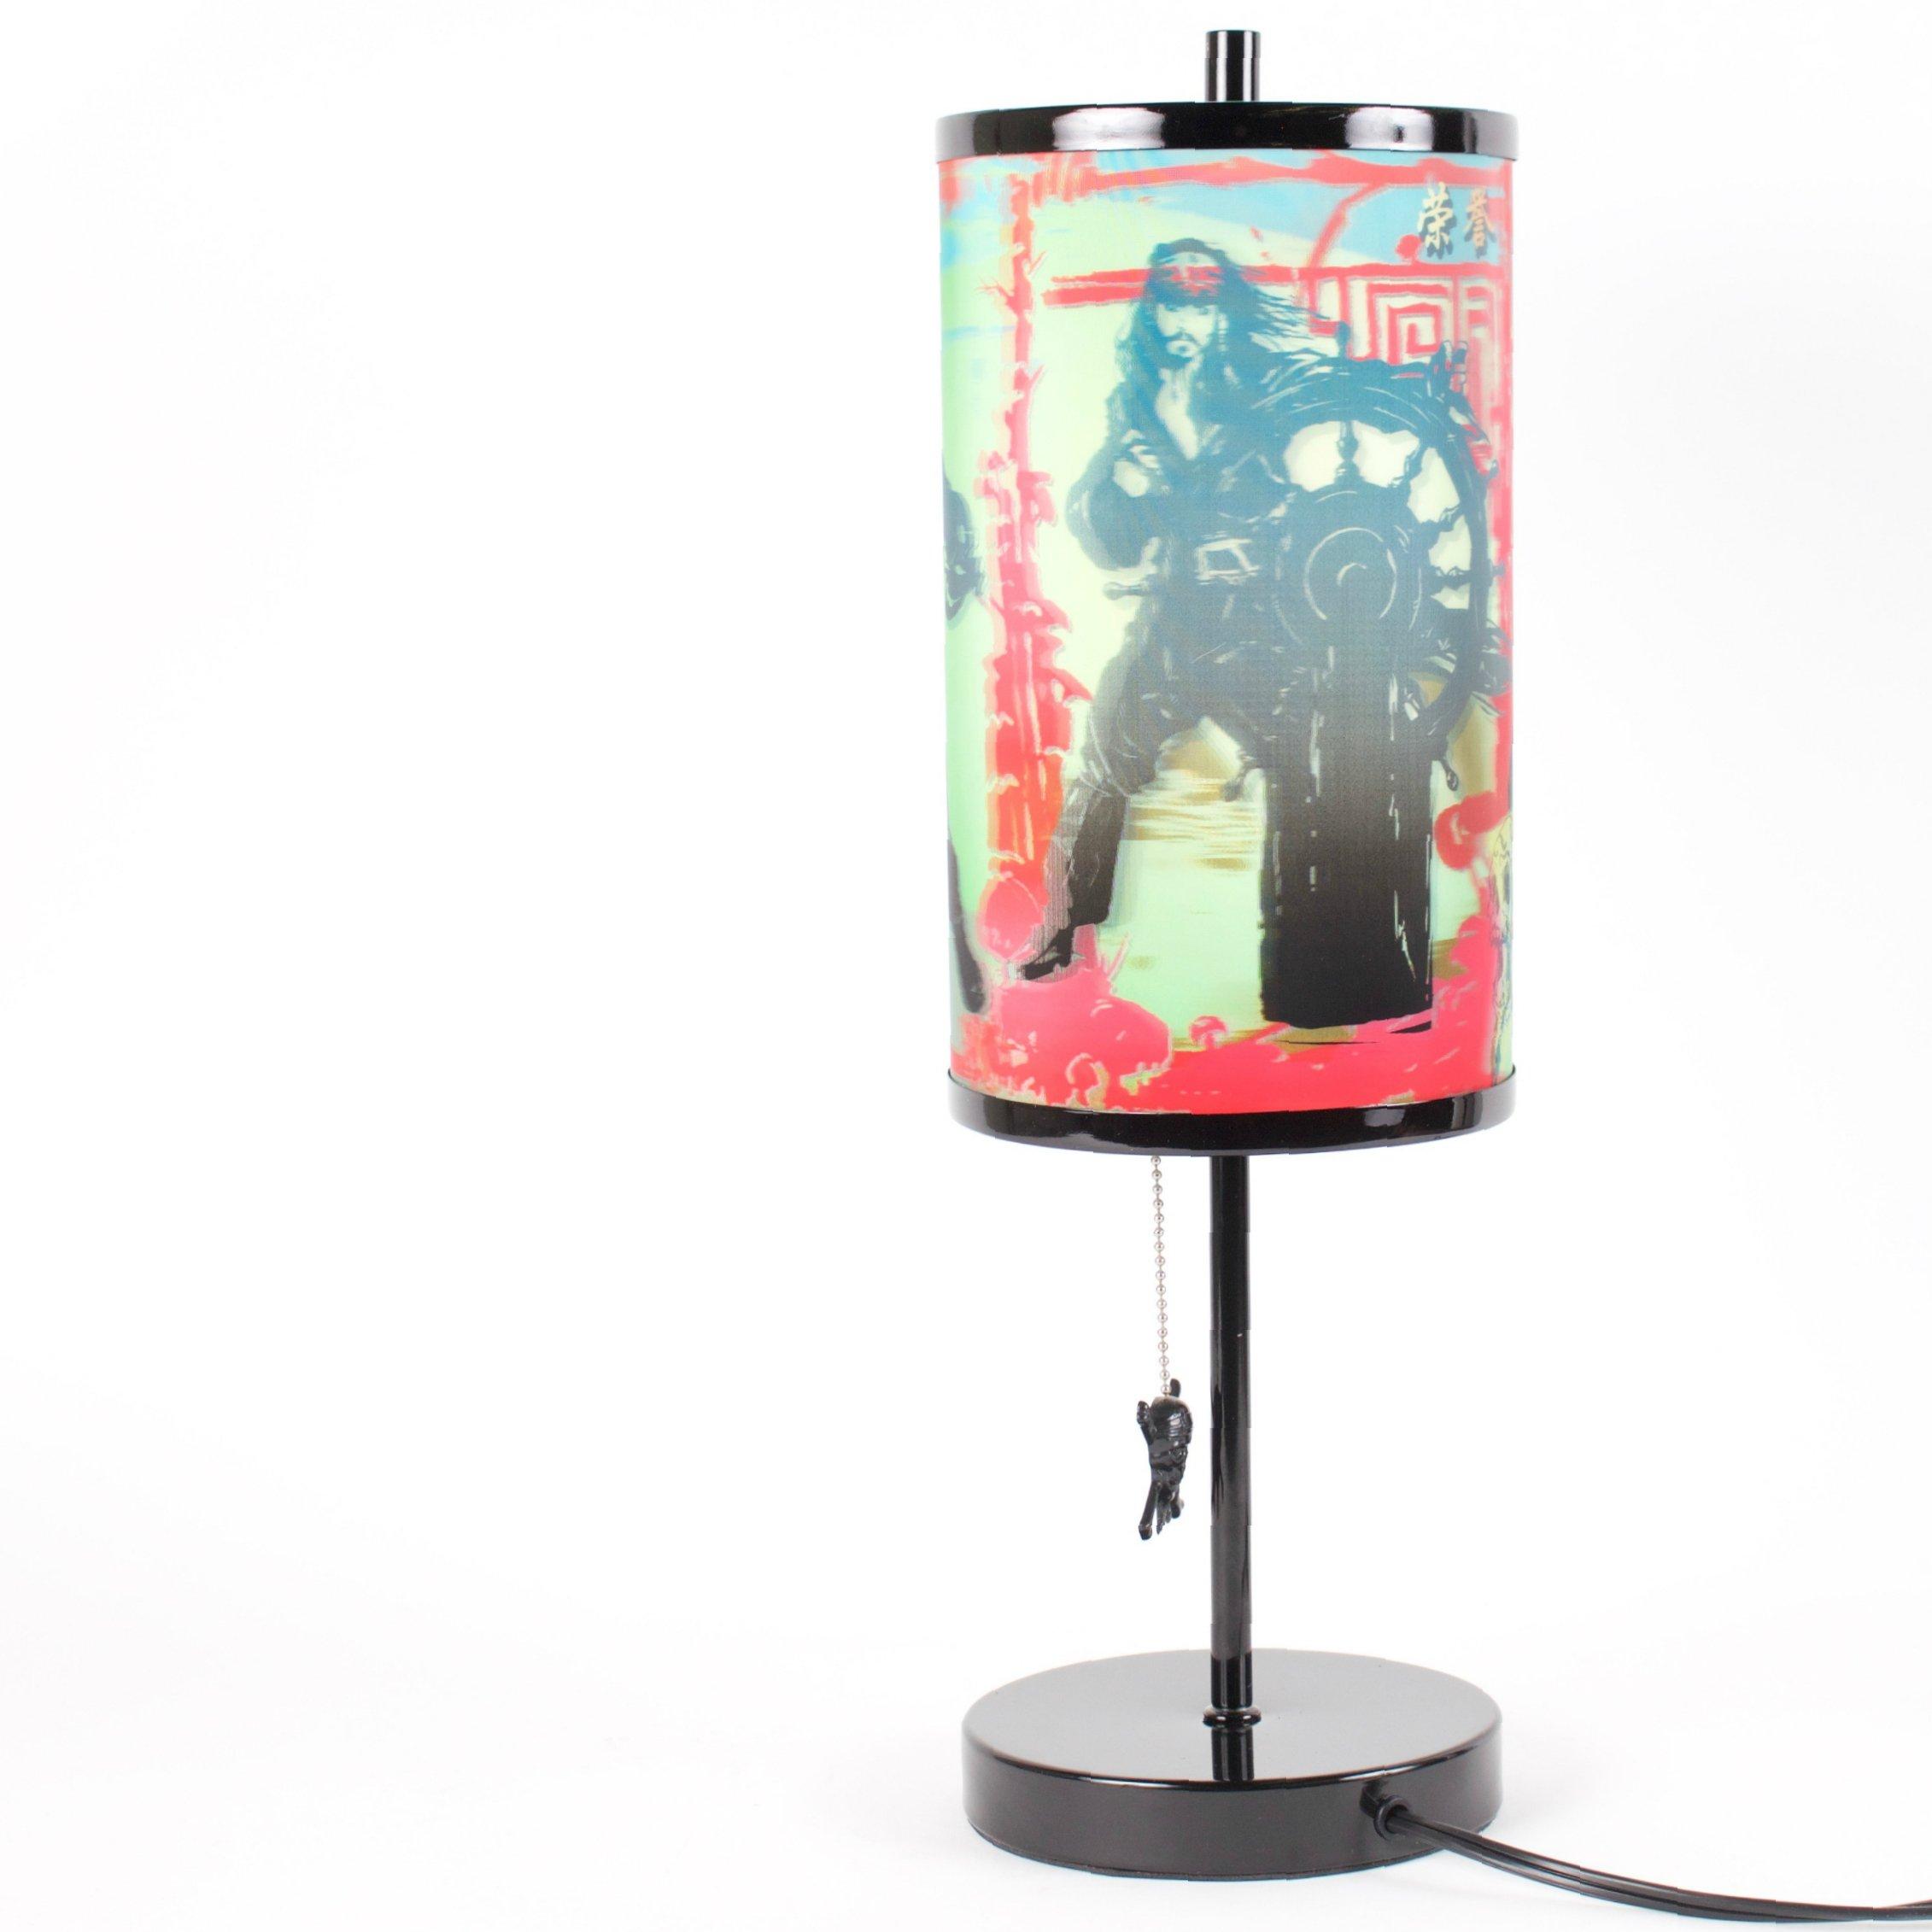 Pirates of the Caribbean 3D Magic Image Lamp